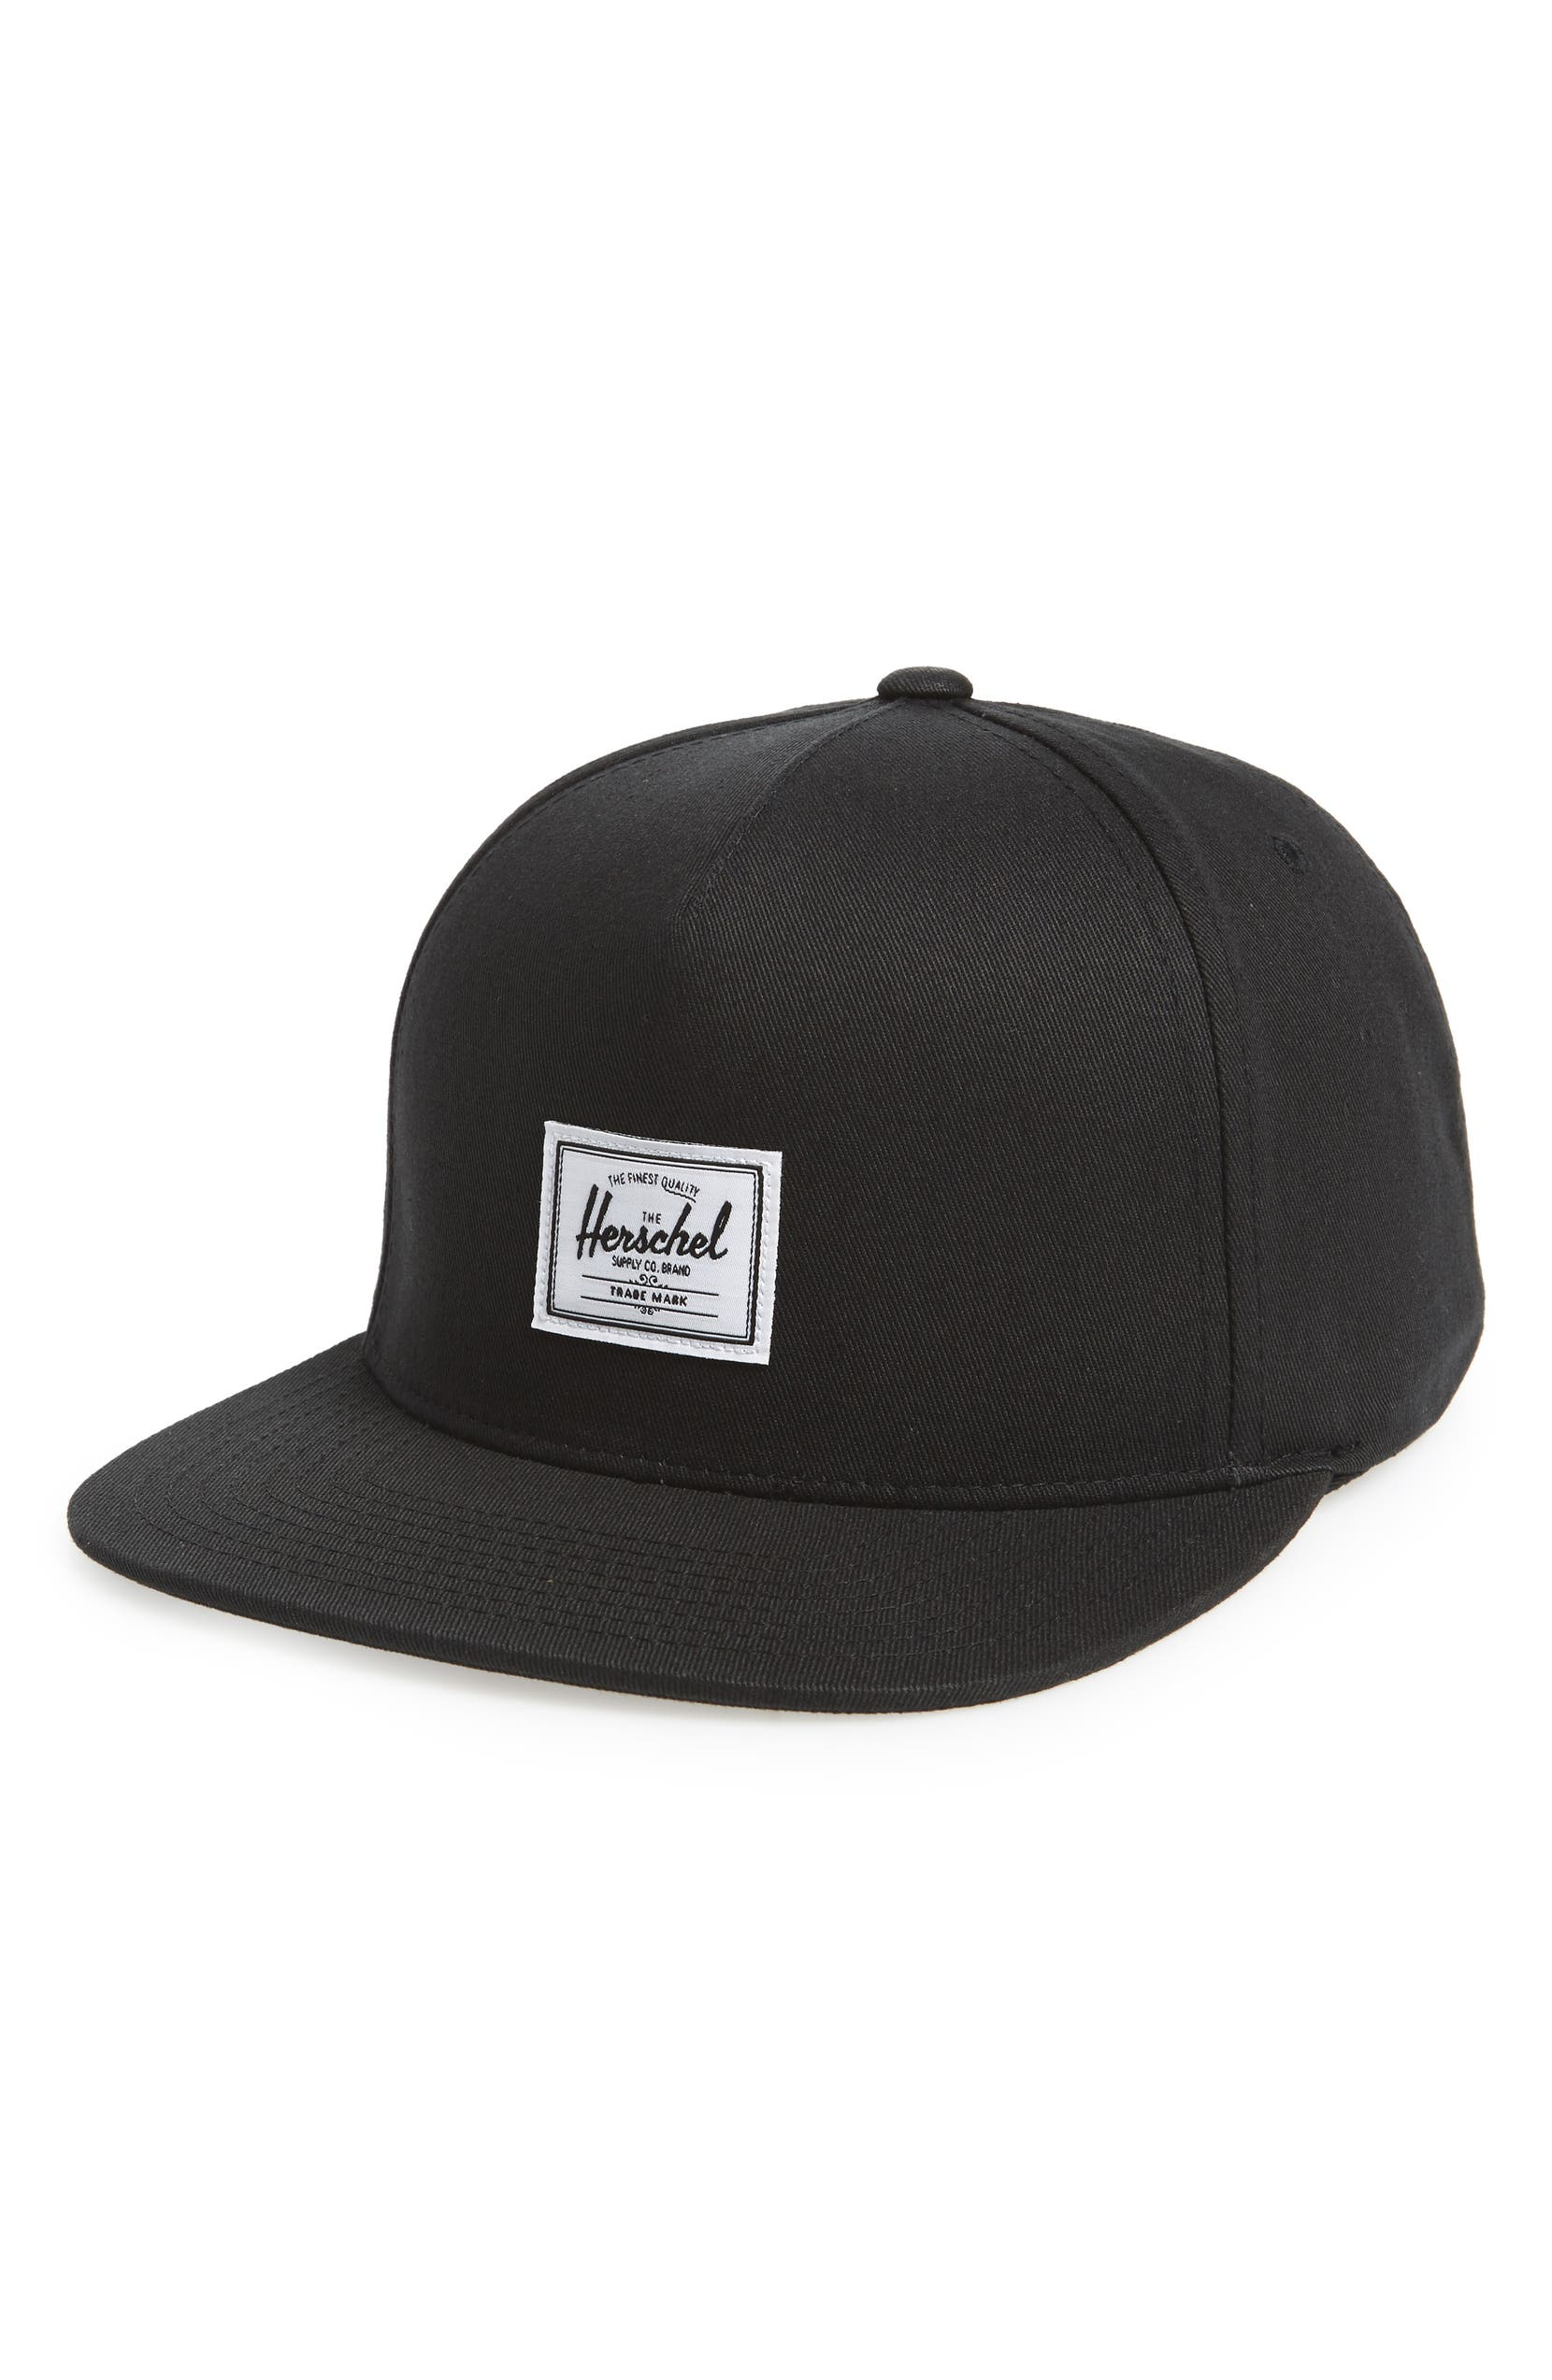 Herschel Supply Co. Dean Snapback Baseball Cap  455fa657d56